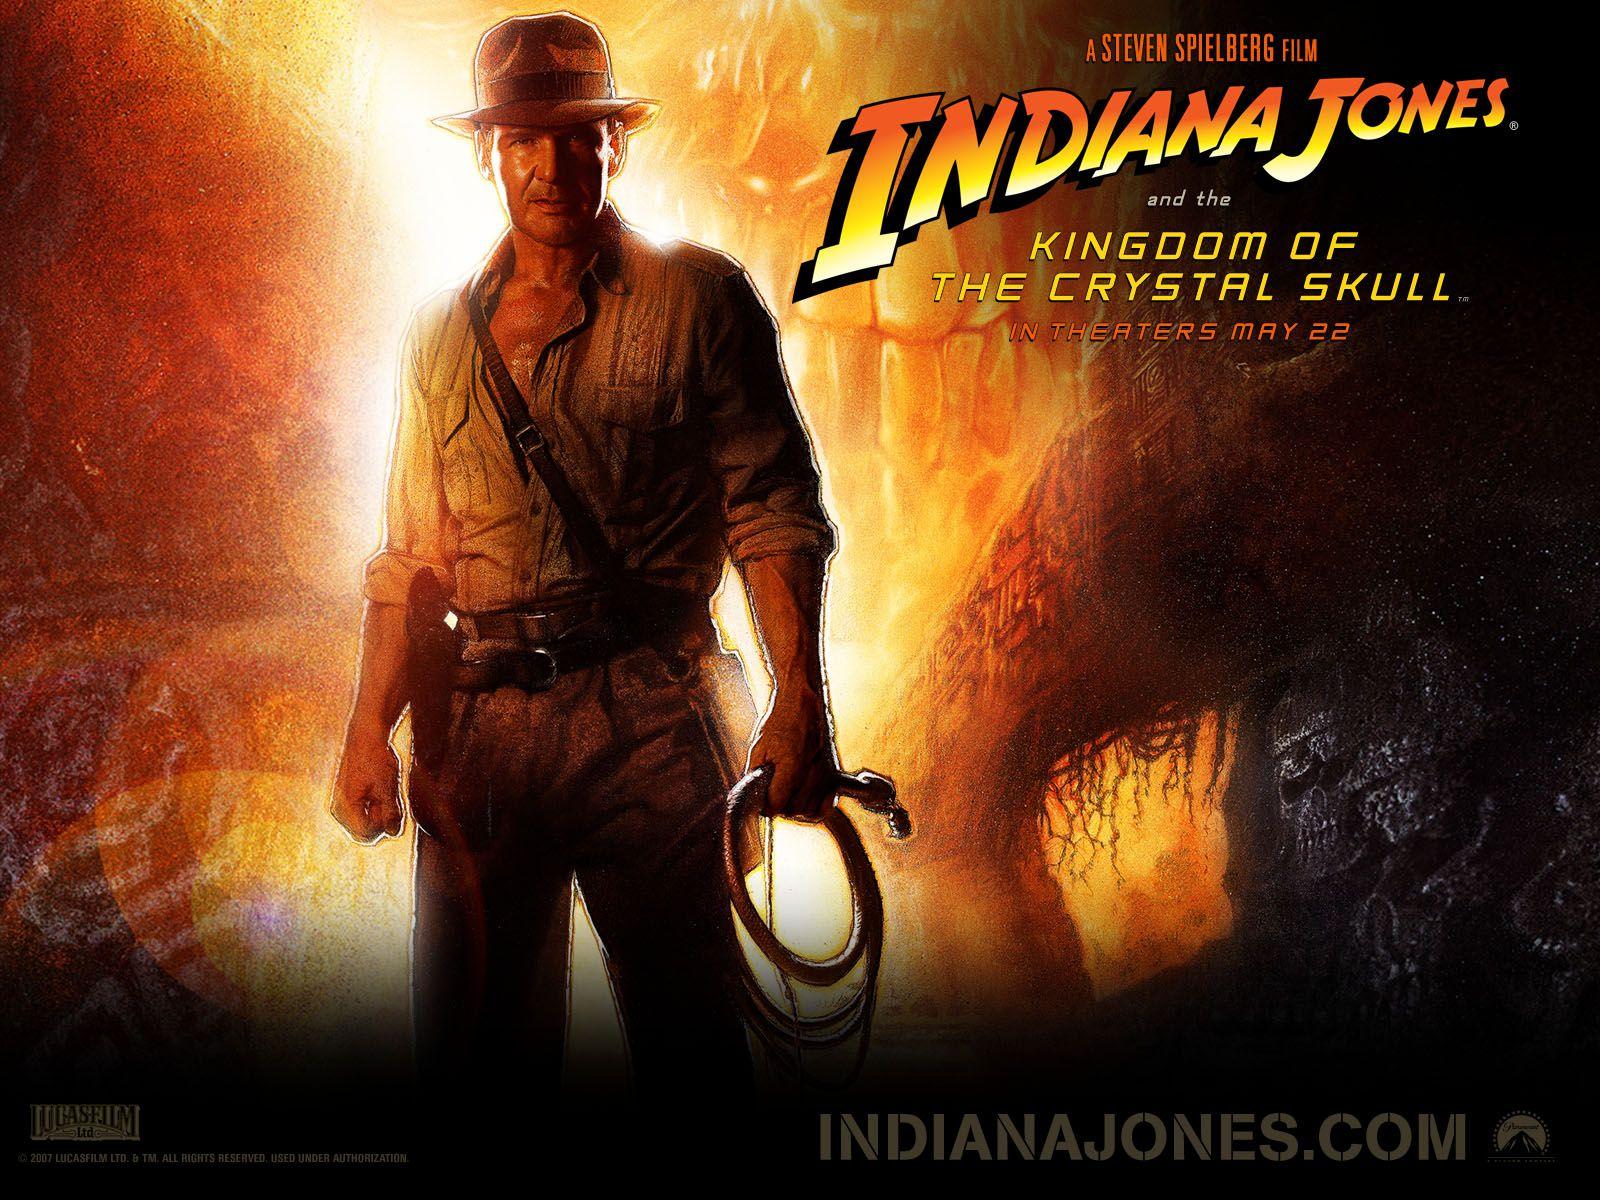 indiana-jones-series_puzzling-movies